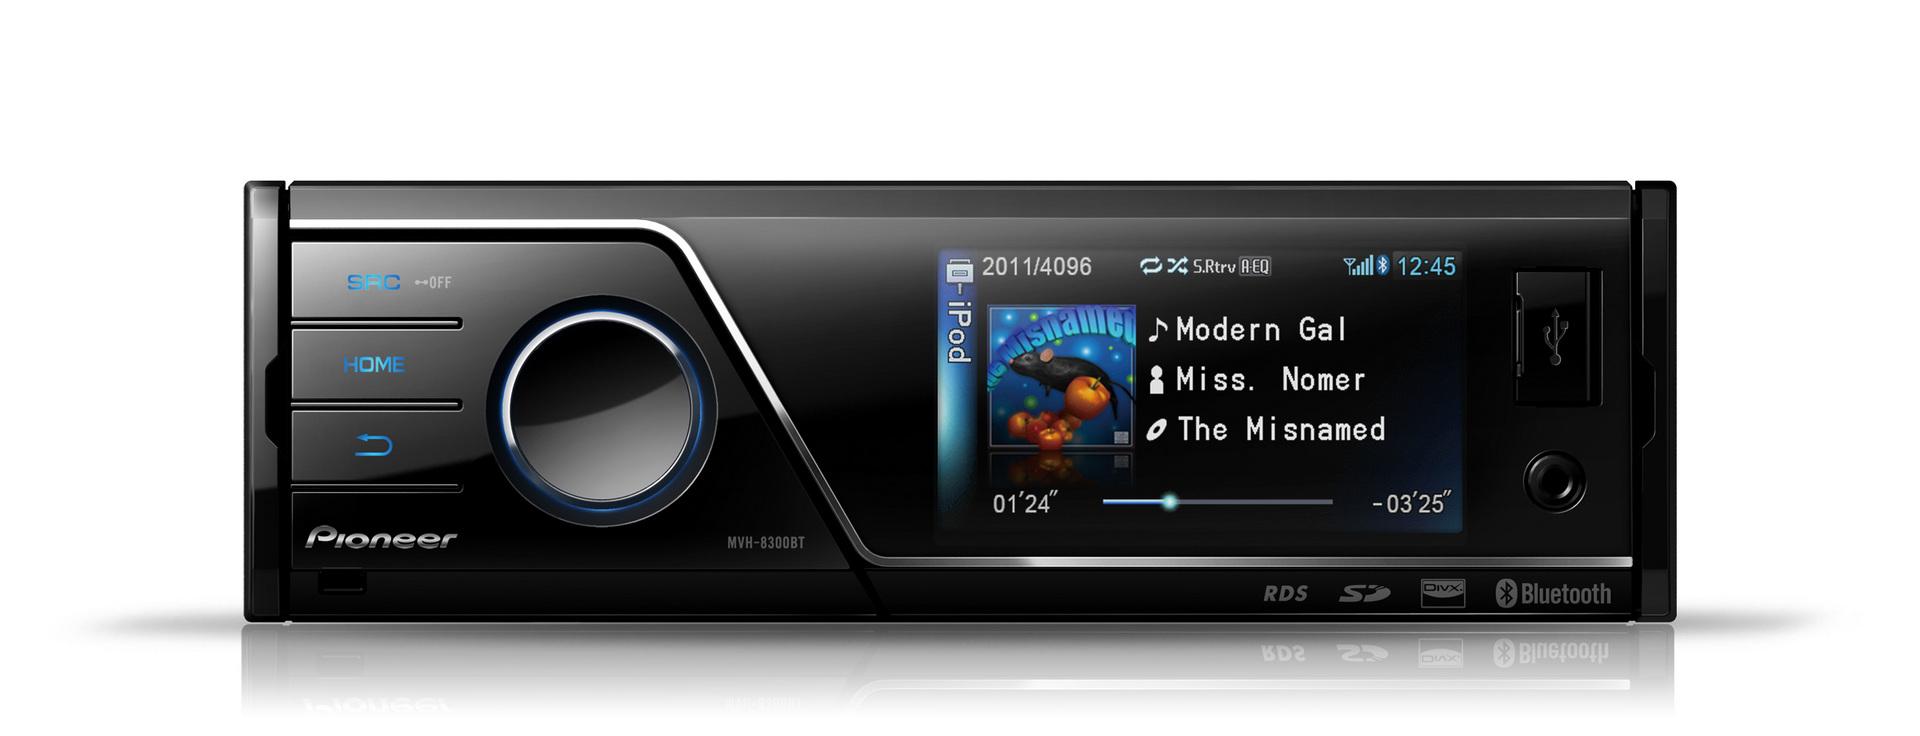 pioneer mvh 8300bt in car vehicle audio ipod usb sound